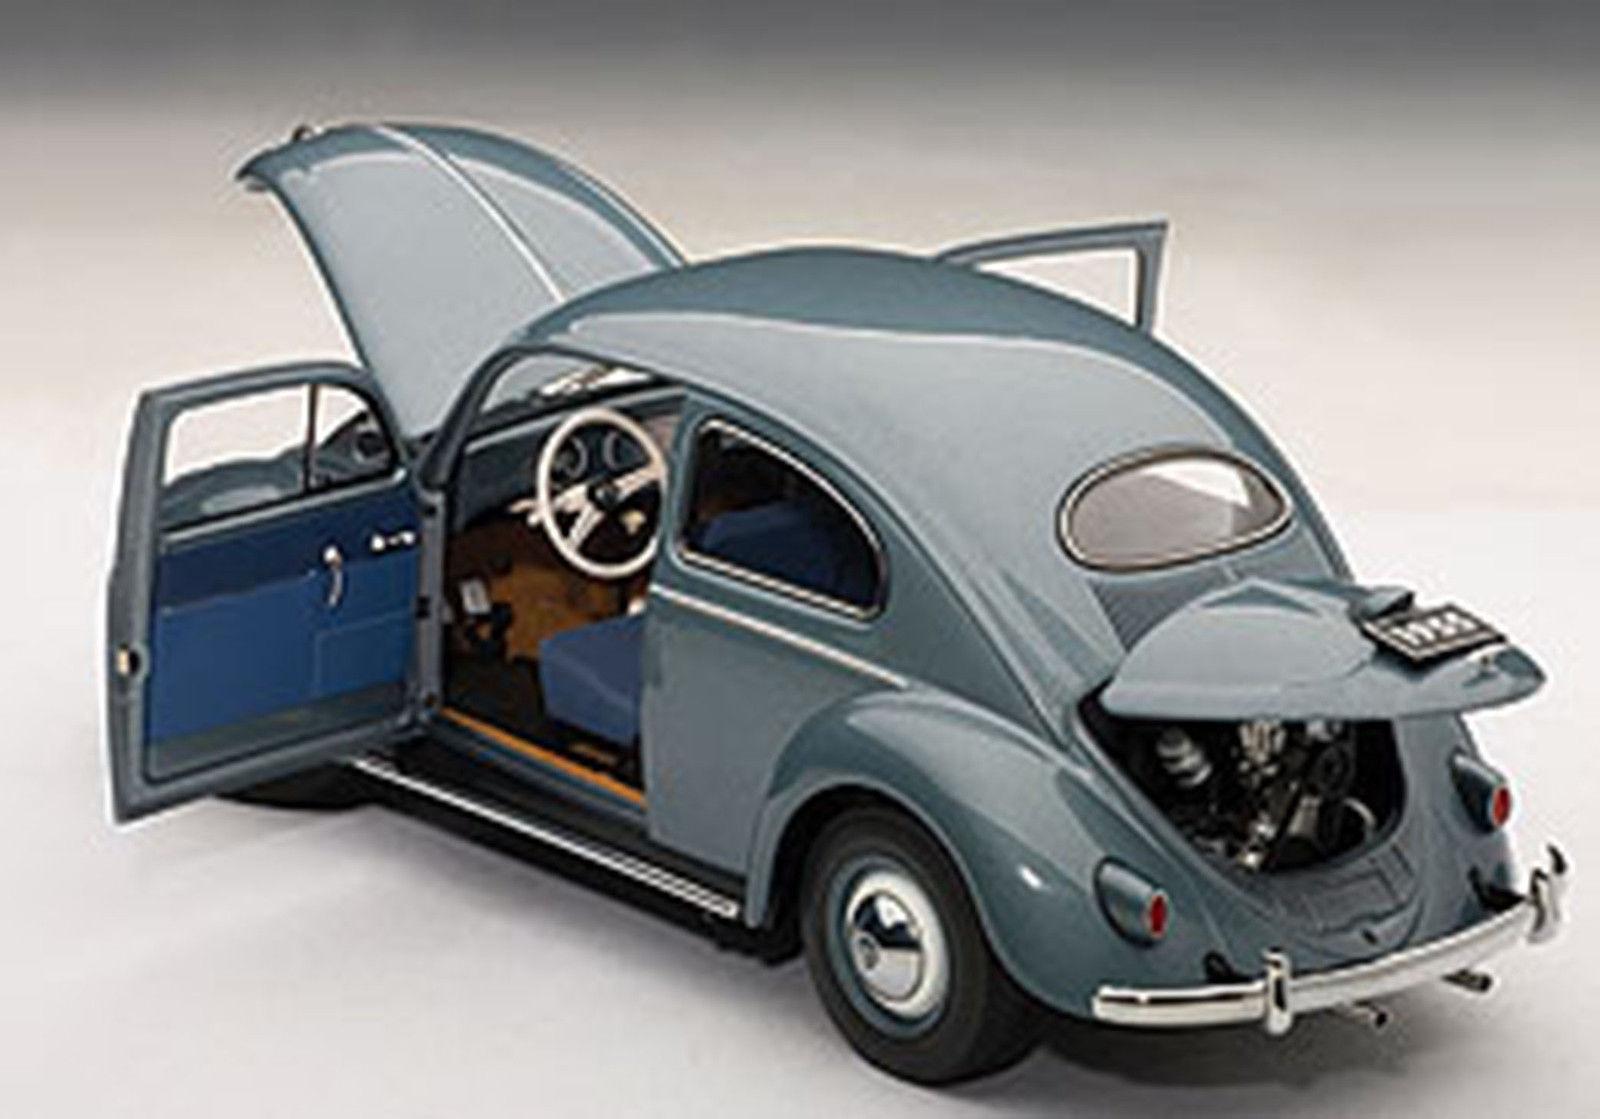 Autoart VOLKSWAGEN LIMOUSINE 1955 STRATOS SILVER 1/18[USA直輸入][大人のミニカー][プレゼントにおすすめ][デイブレイク]